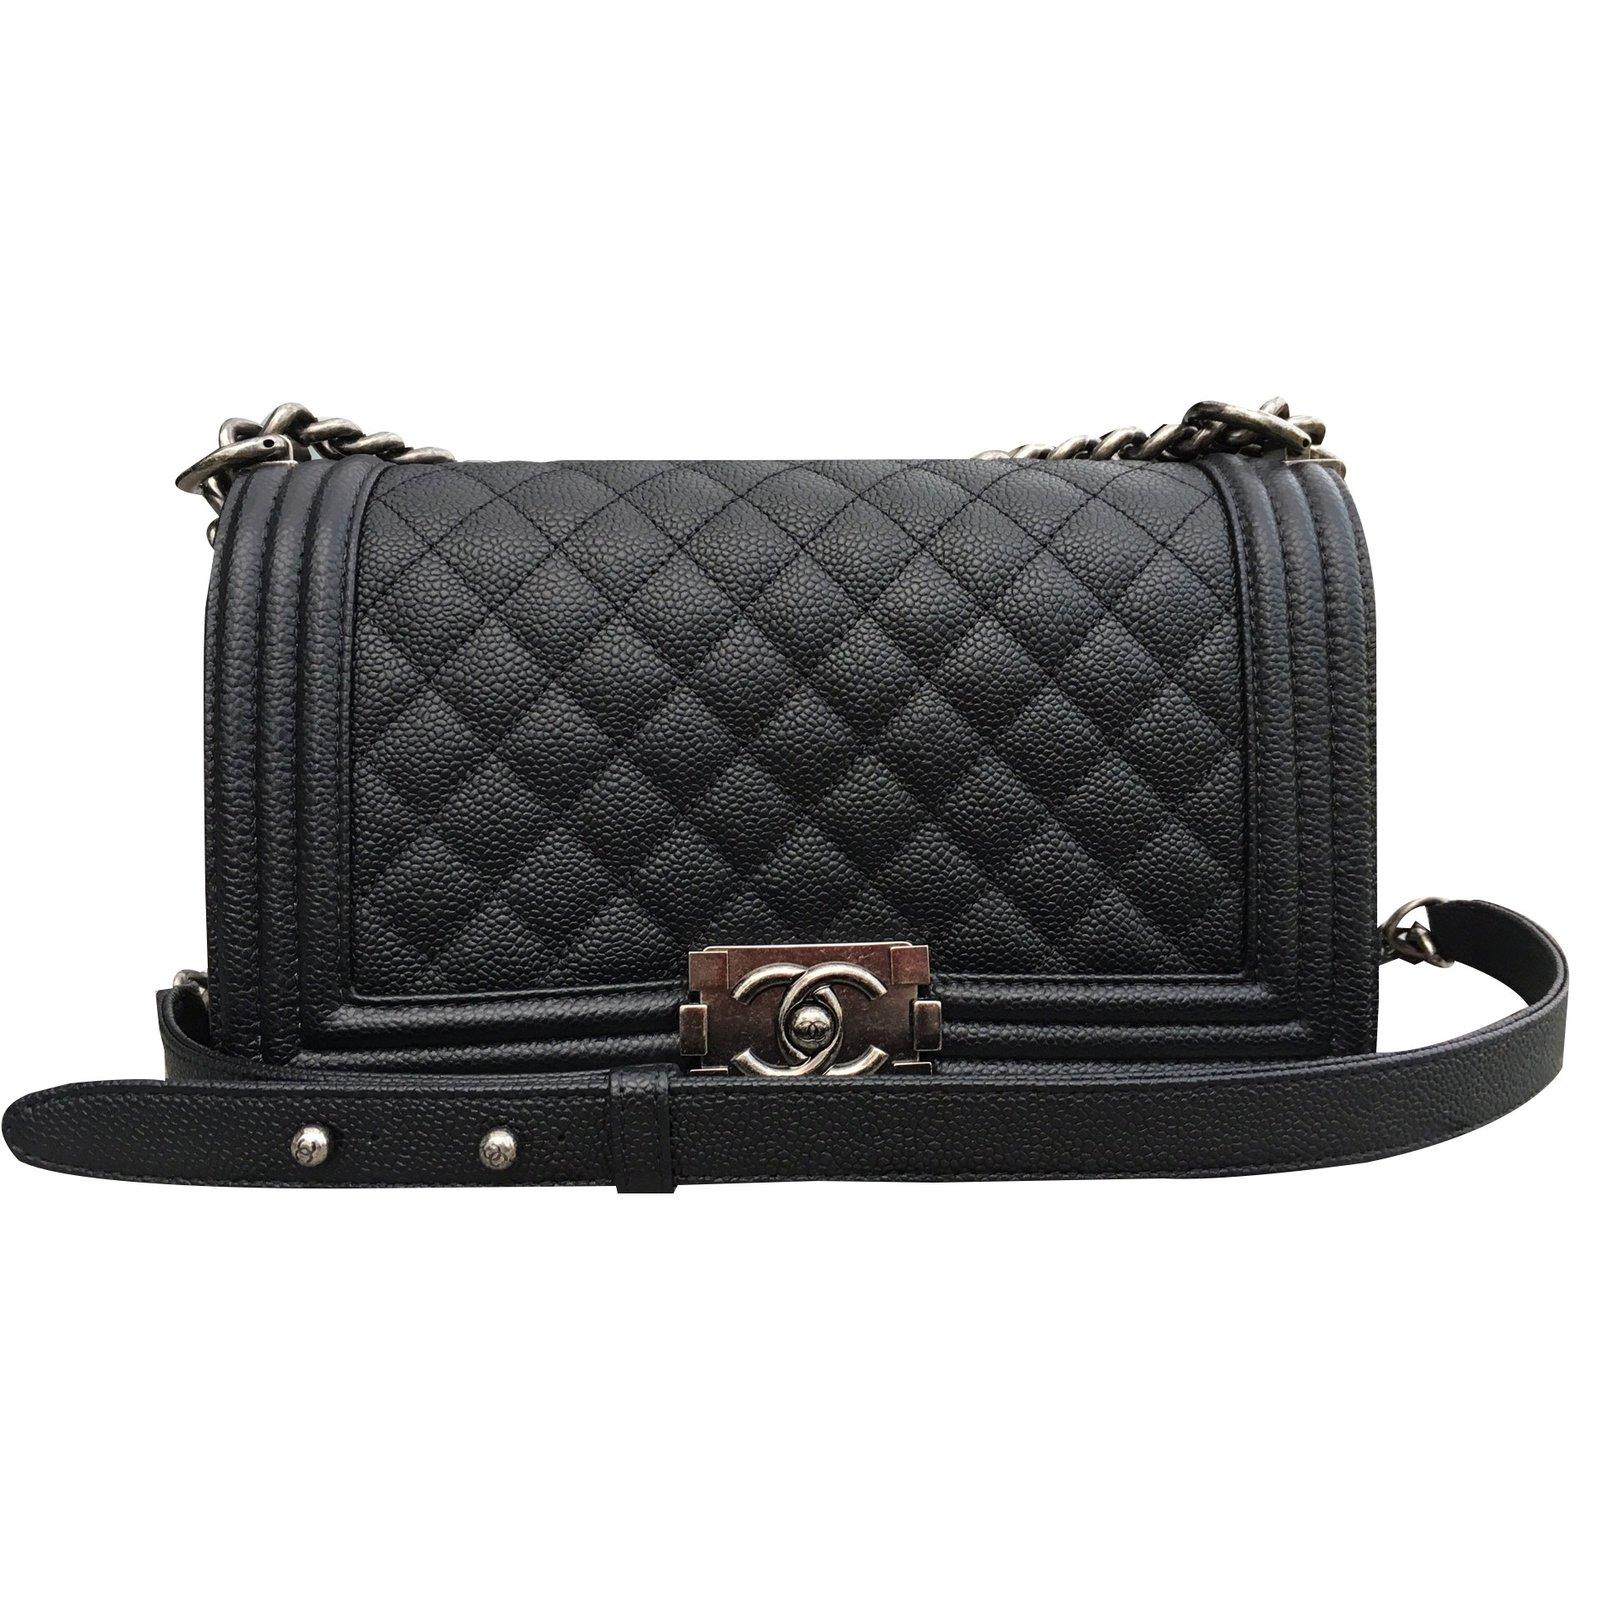 dc3cdcad39ca Sacs à main Chanel Boy Old Medium caviar Cuir Noir ref.32779 - Joli ...